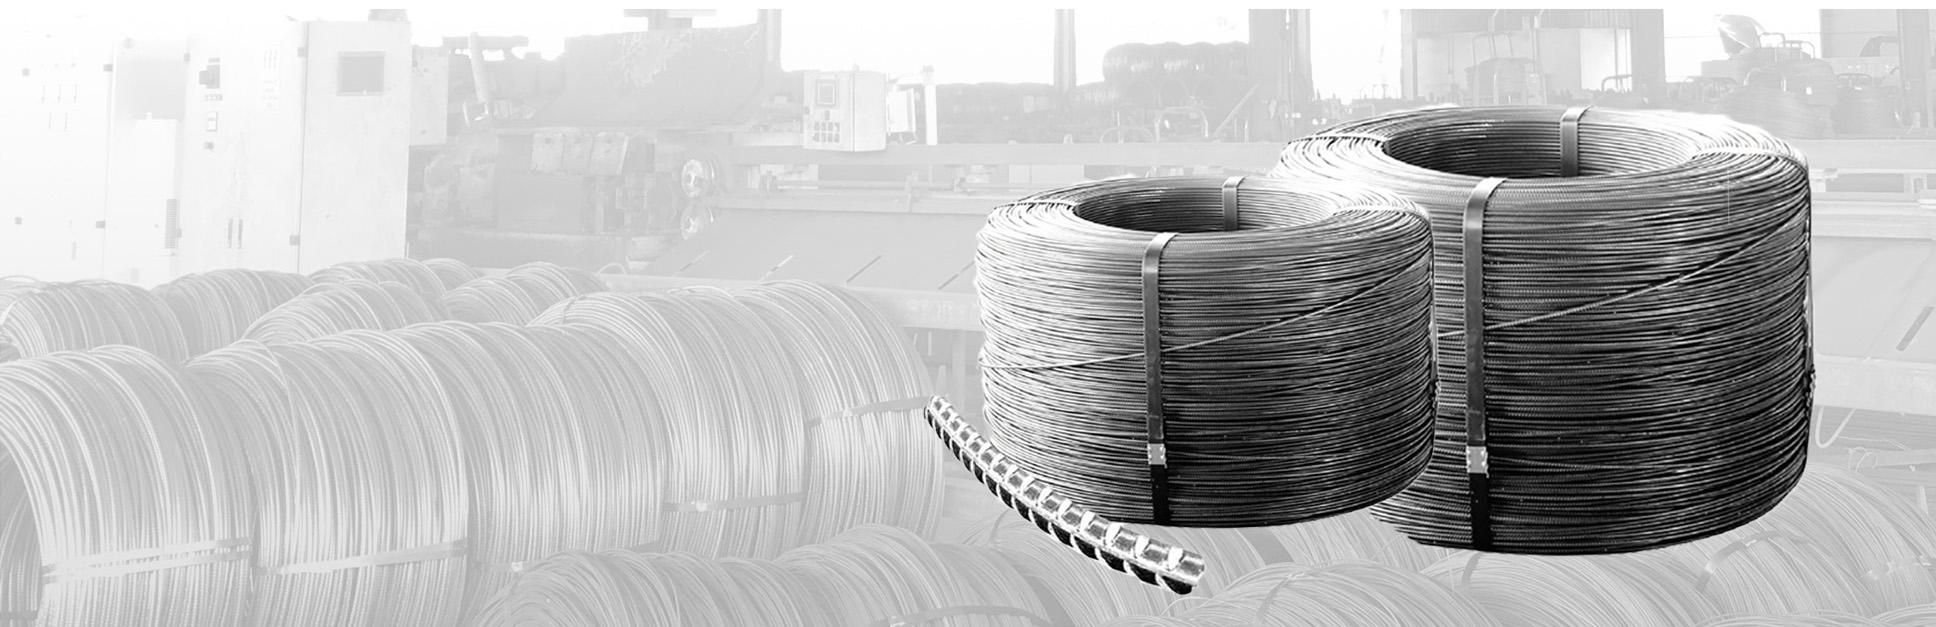 Australia Concrete Steel, Australia Ribbed Steel, Australia ...